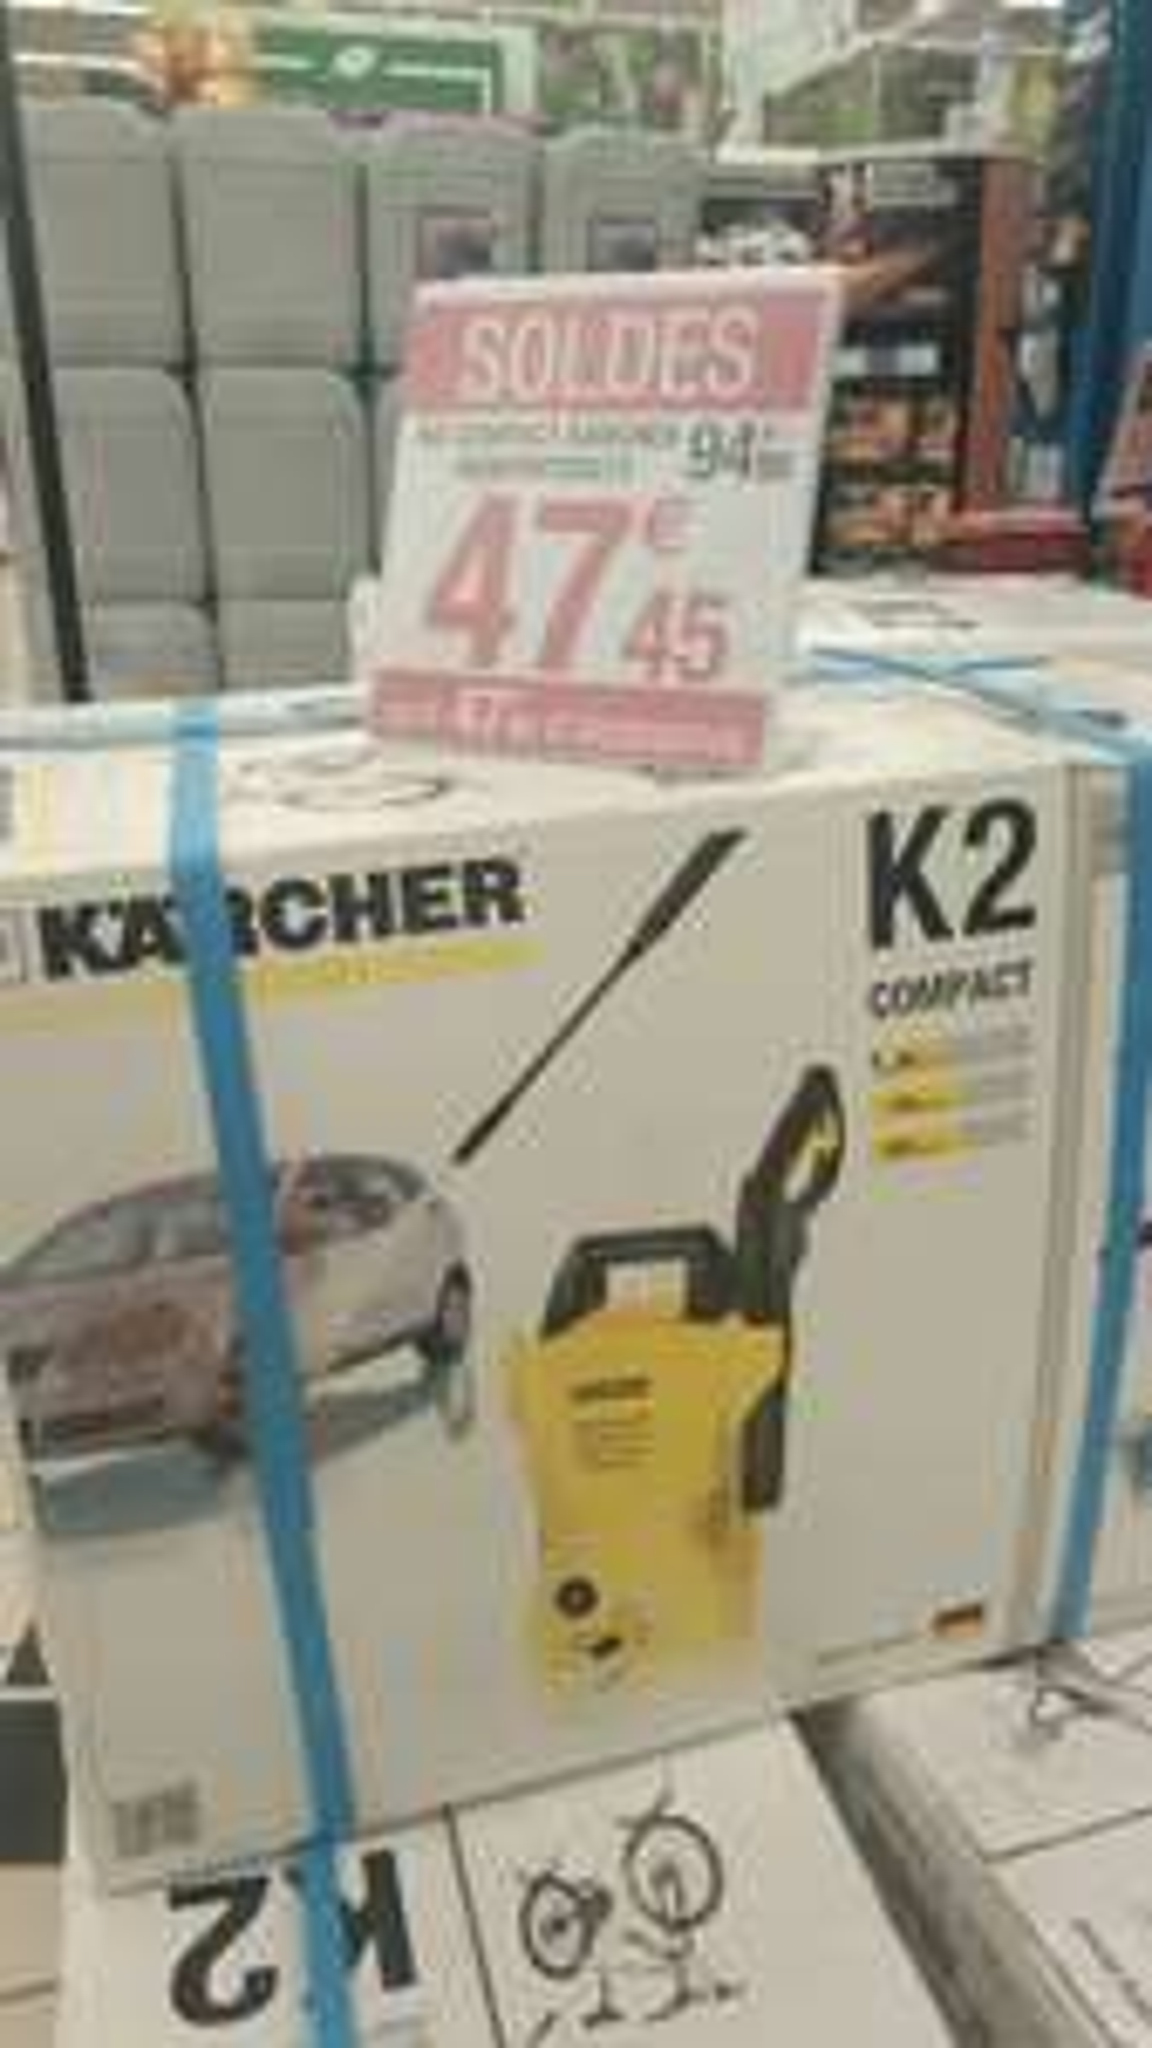 Nettoyeur haute pression Karcher K2 Compact 1400w - Antibes (06)